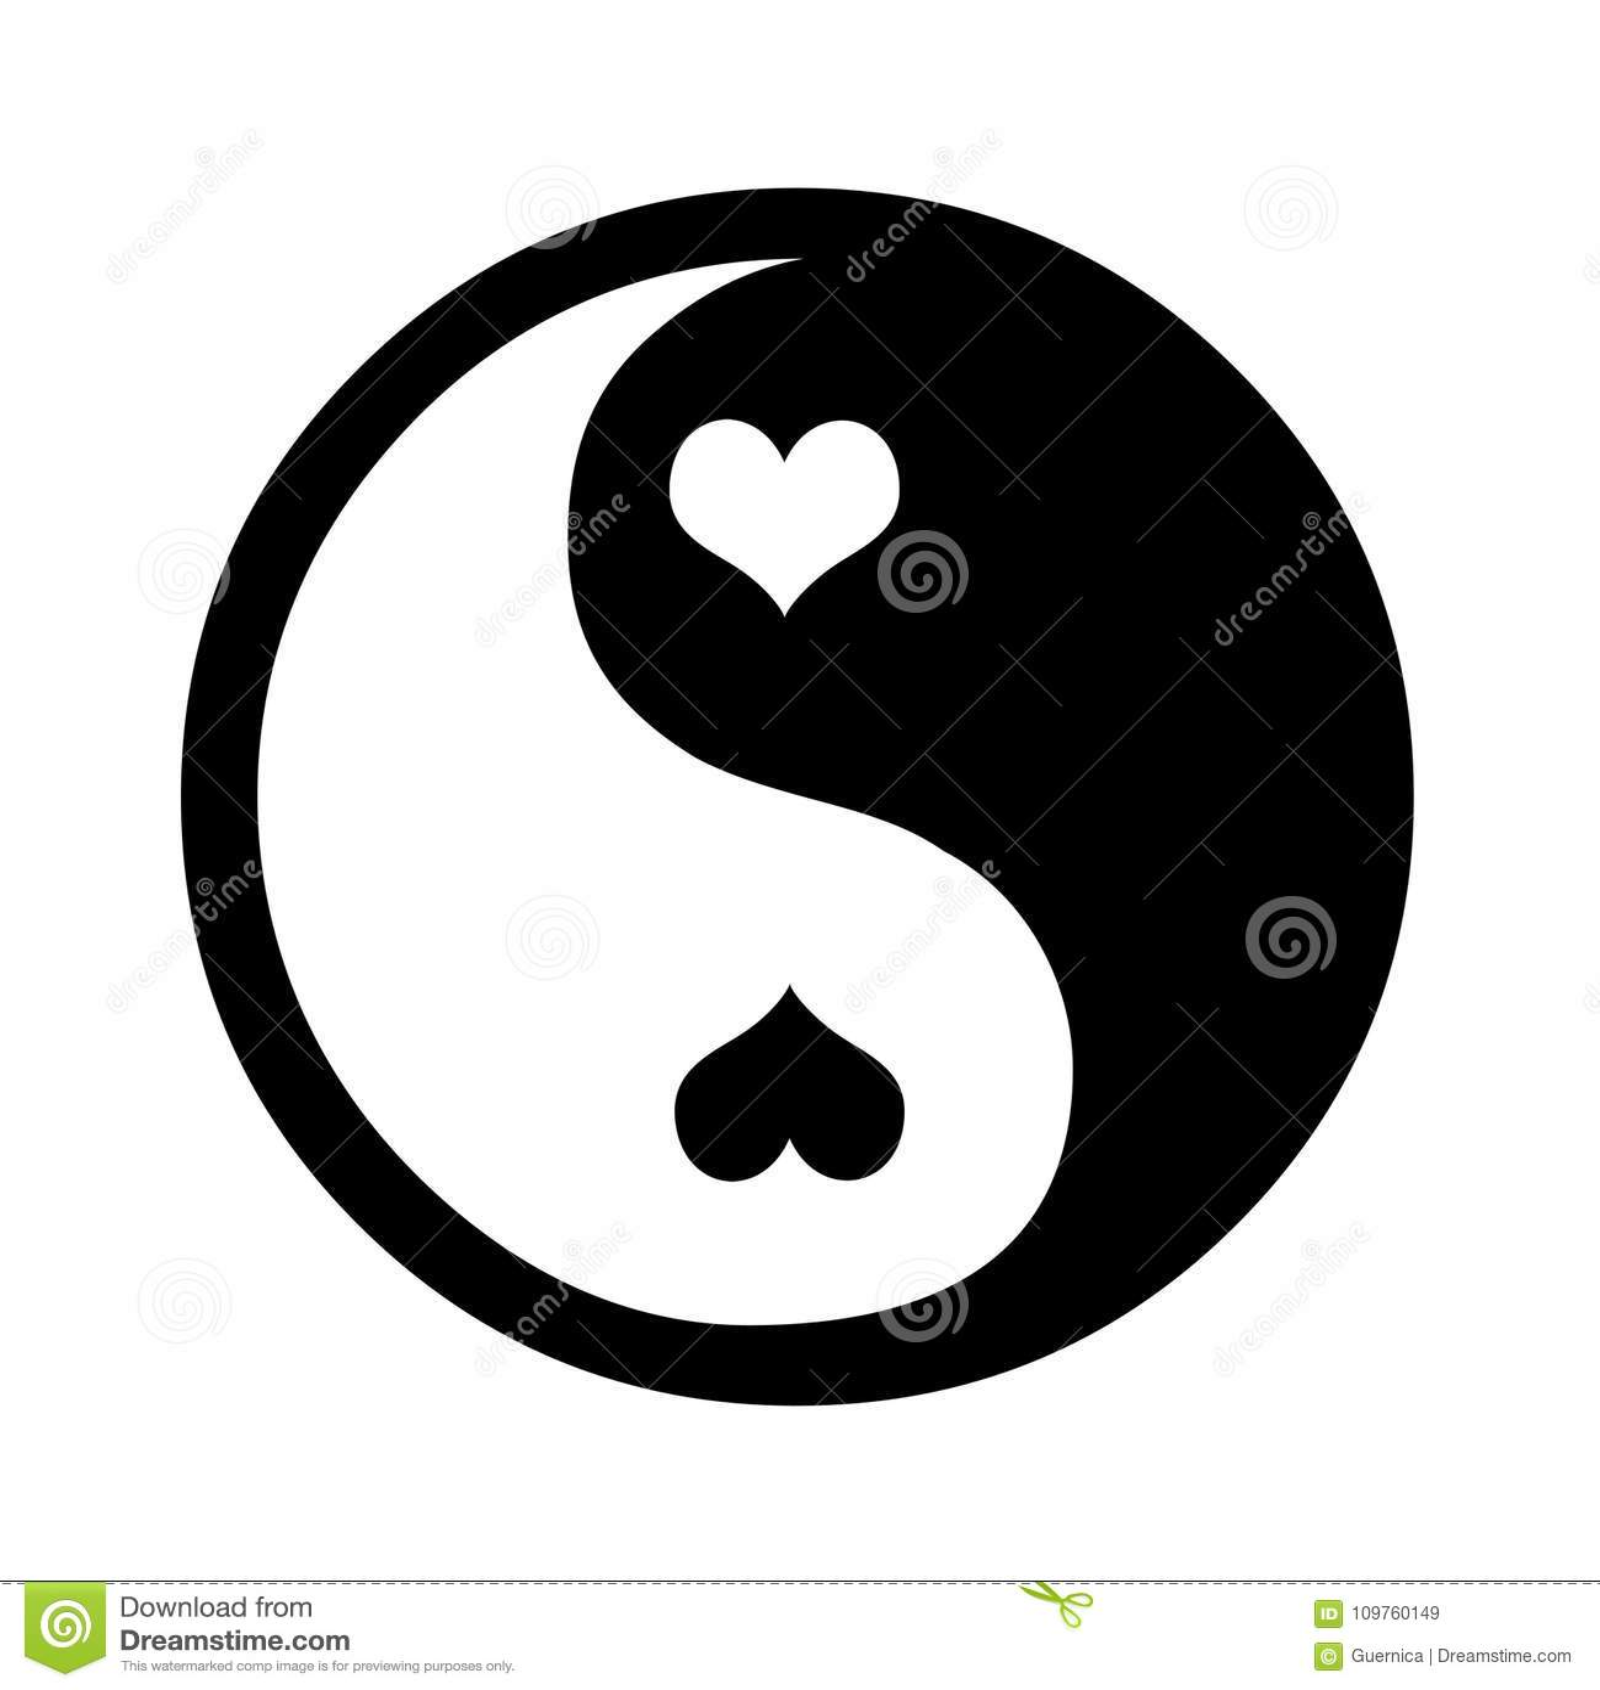 Ying Yang Hearts Illustration Contrast Stock Illustration